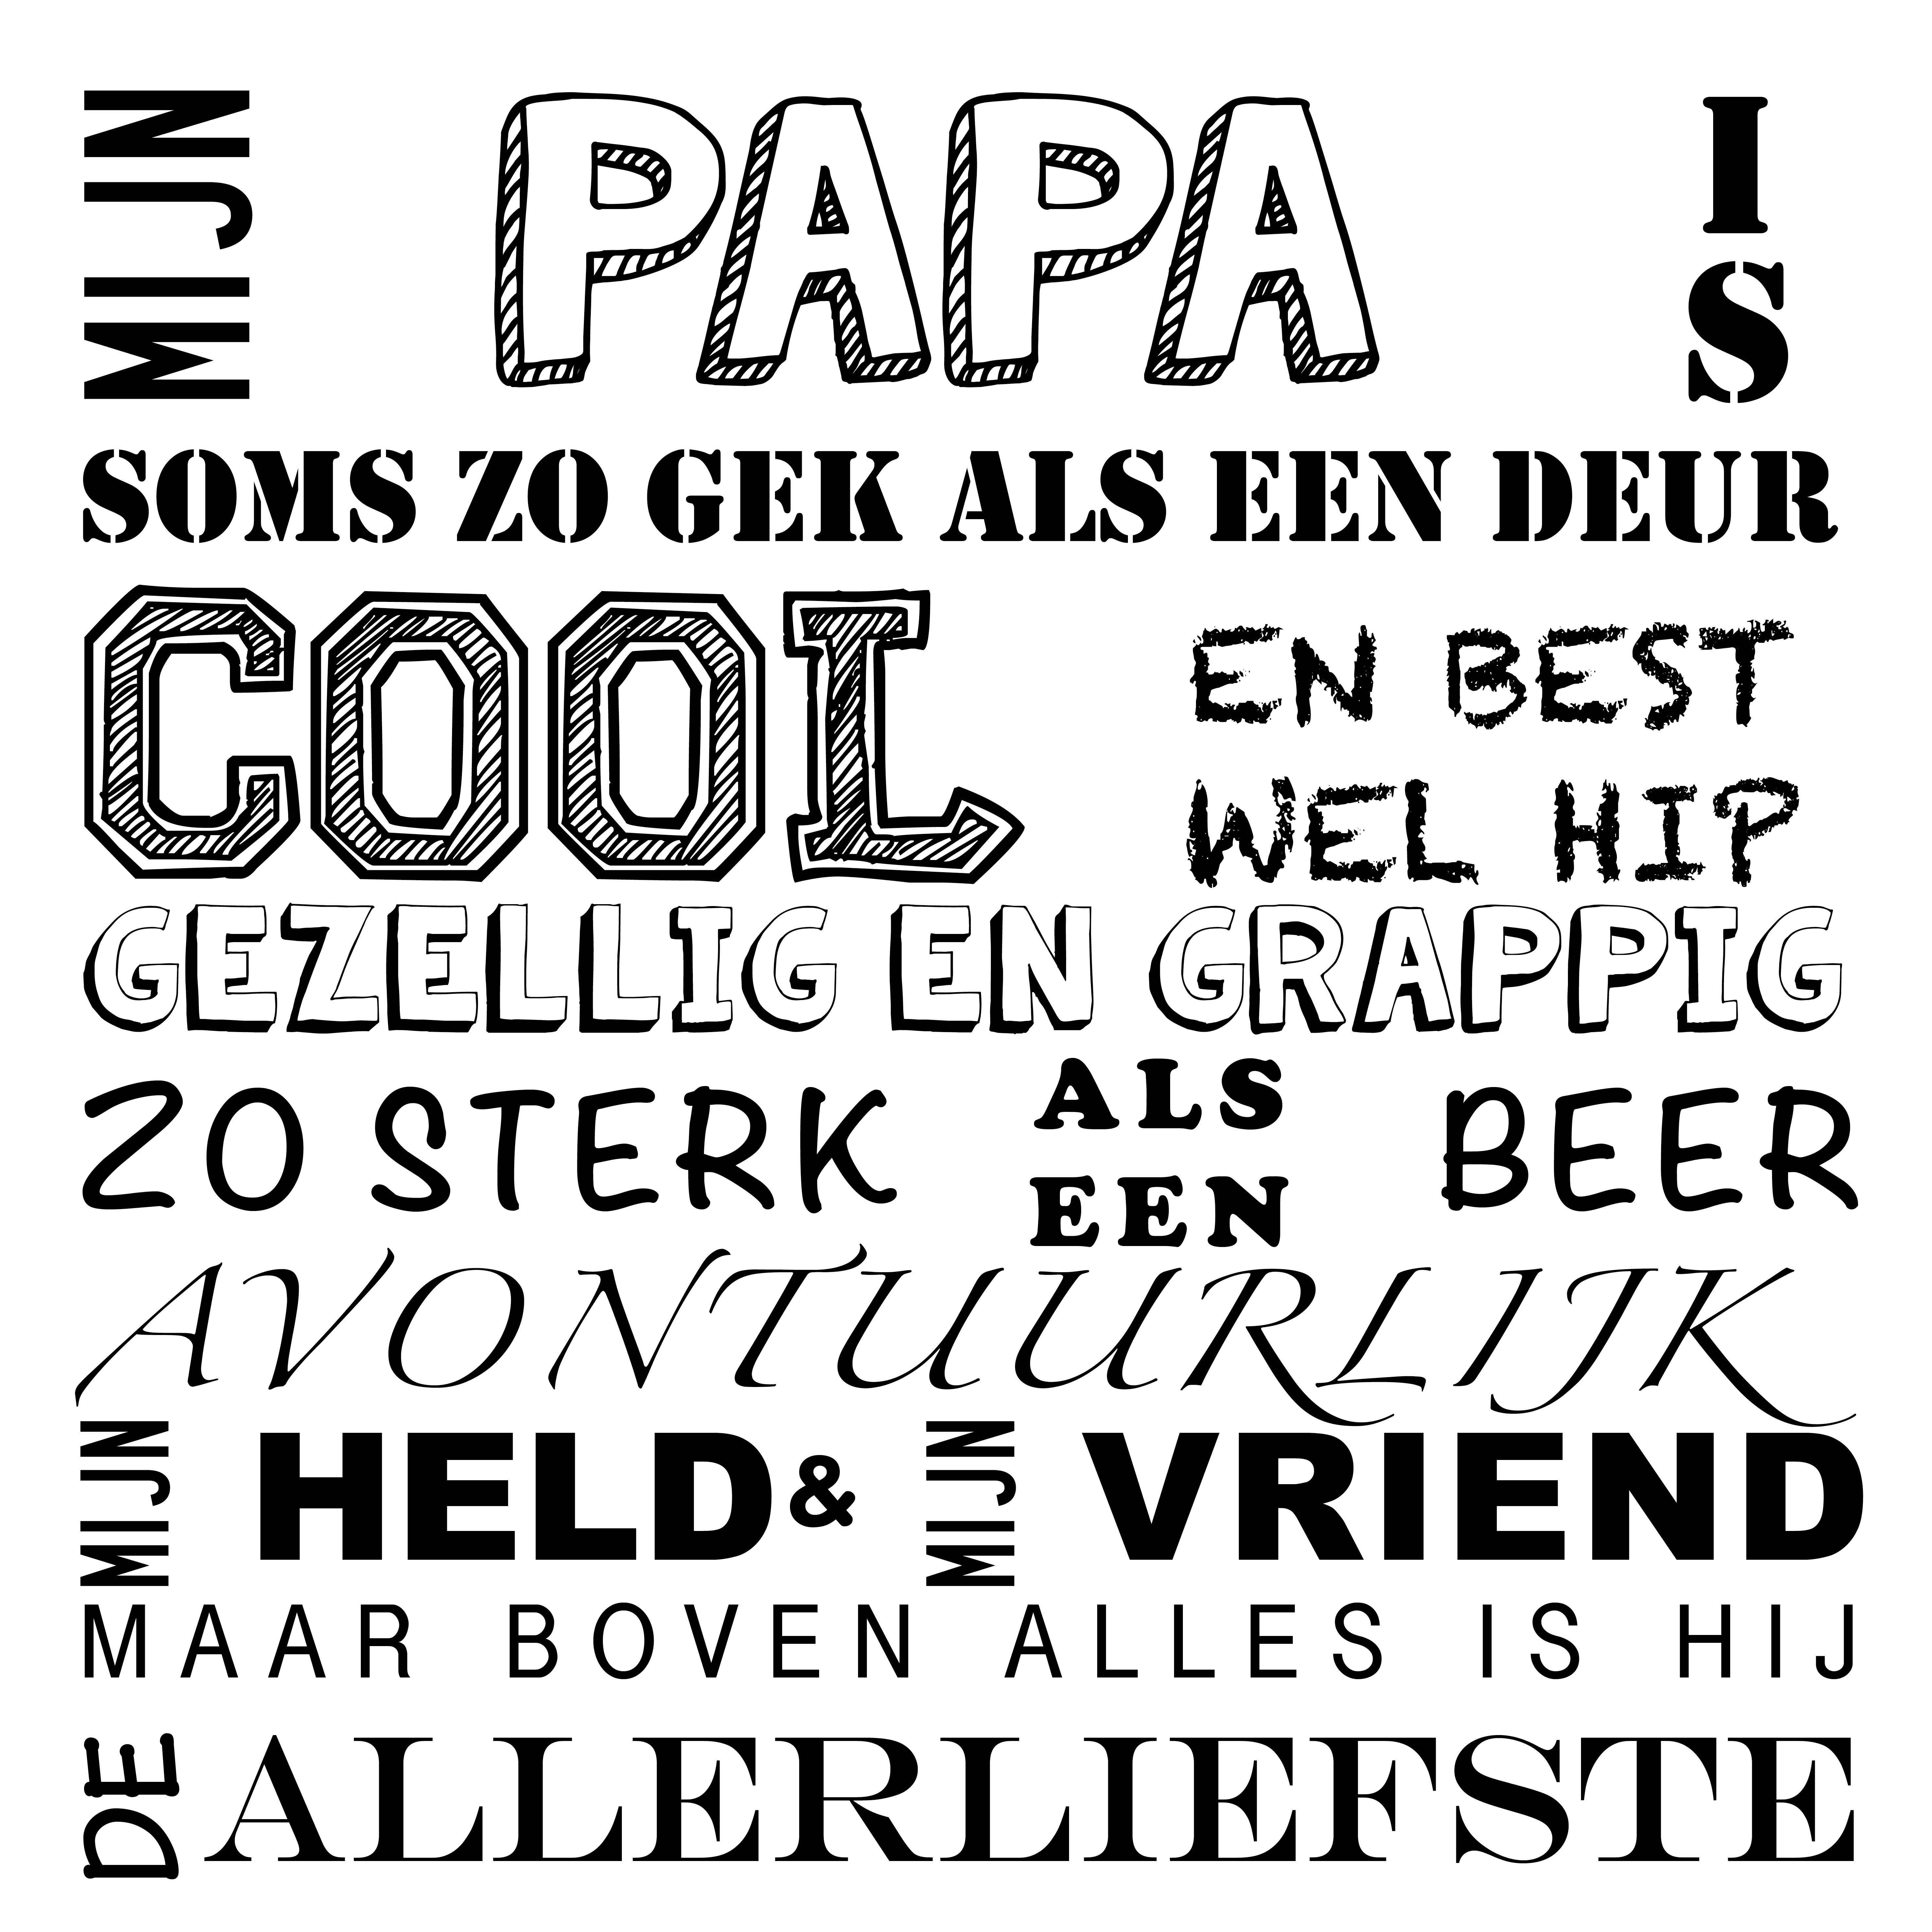 Spreukbord Mijn Papa Plexiglas Superhelden Grappig En